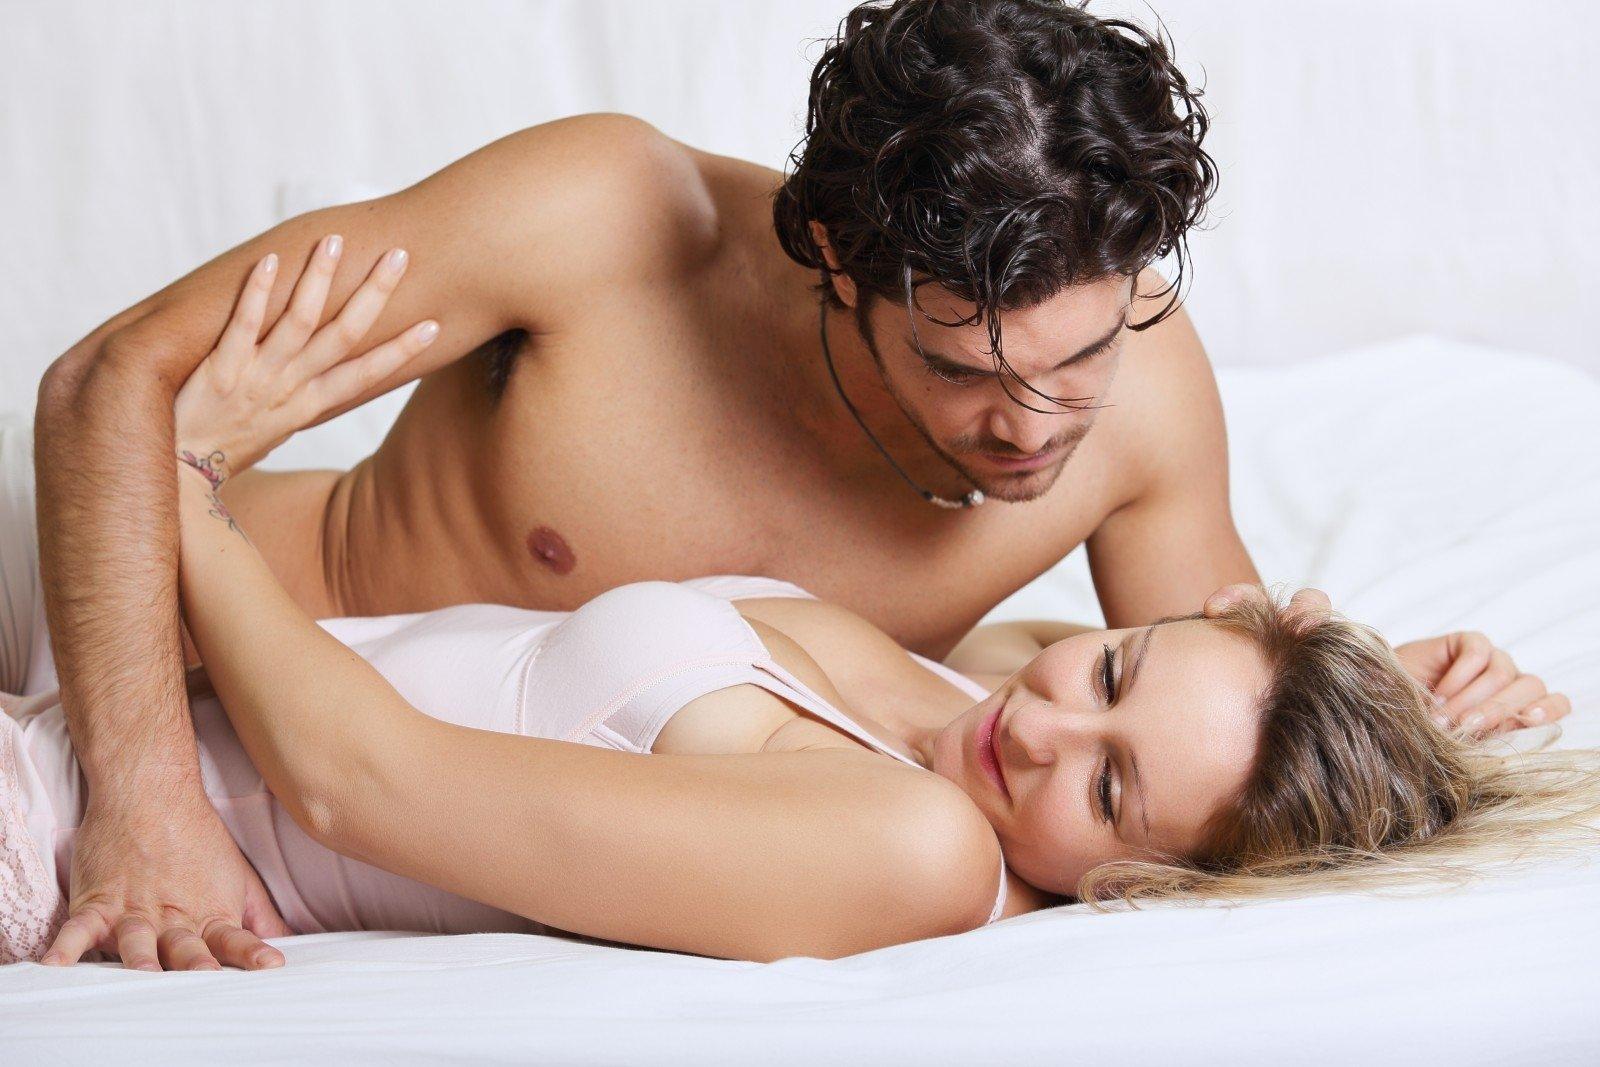 Фото интимное женщин секс — img 8